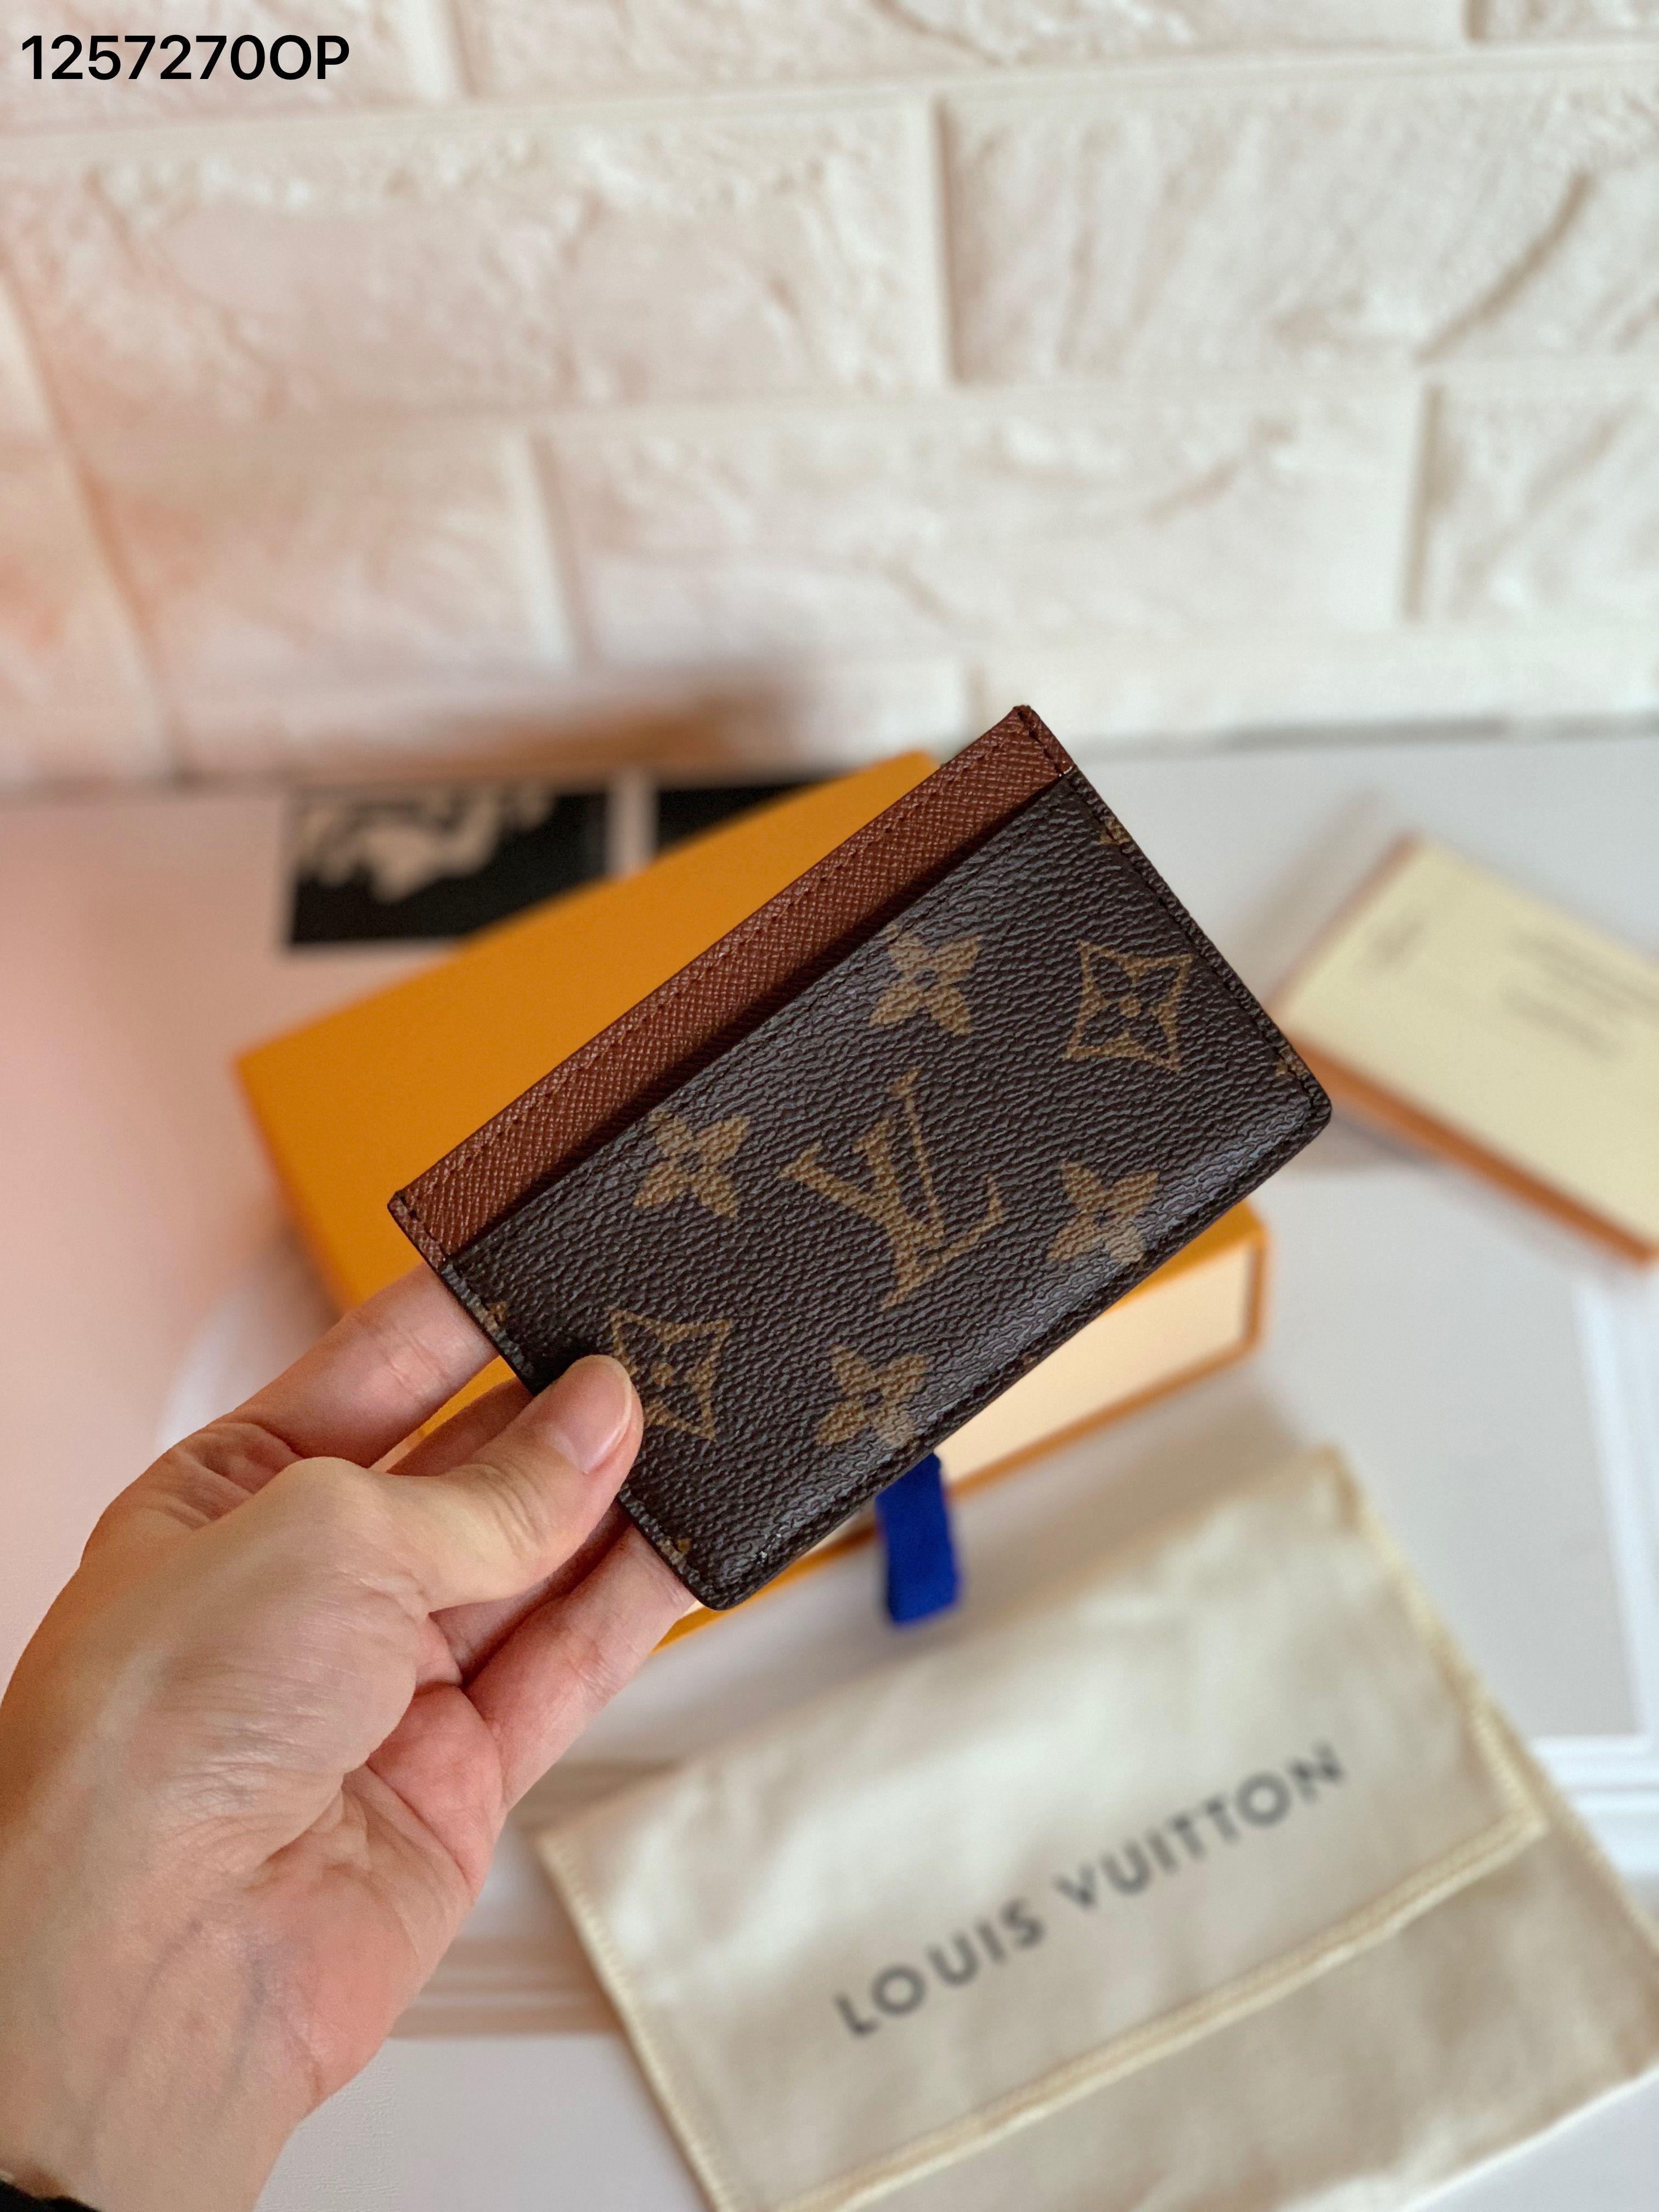 Louis vuitton lv monogram card holder card holder